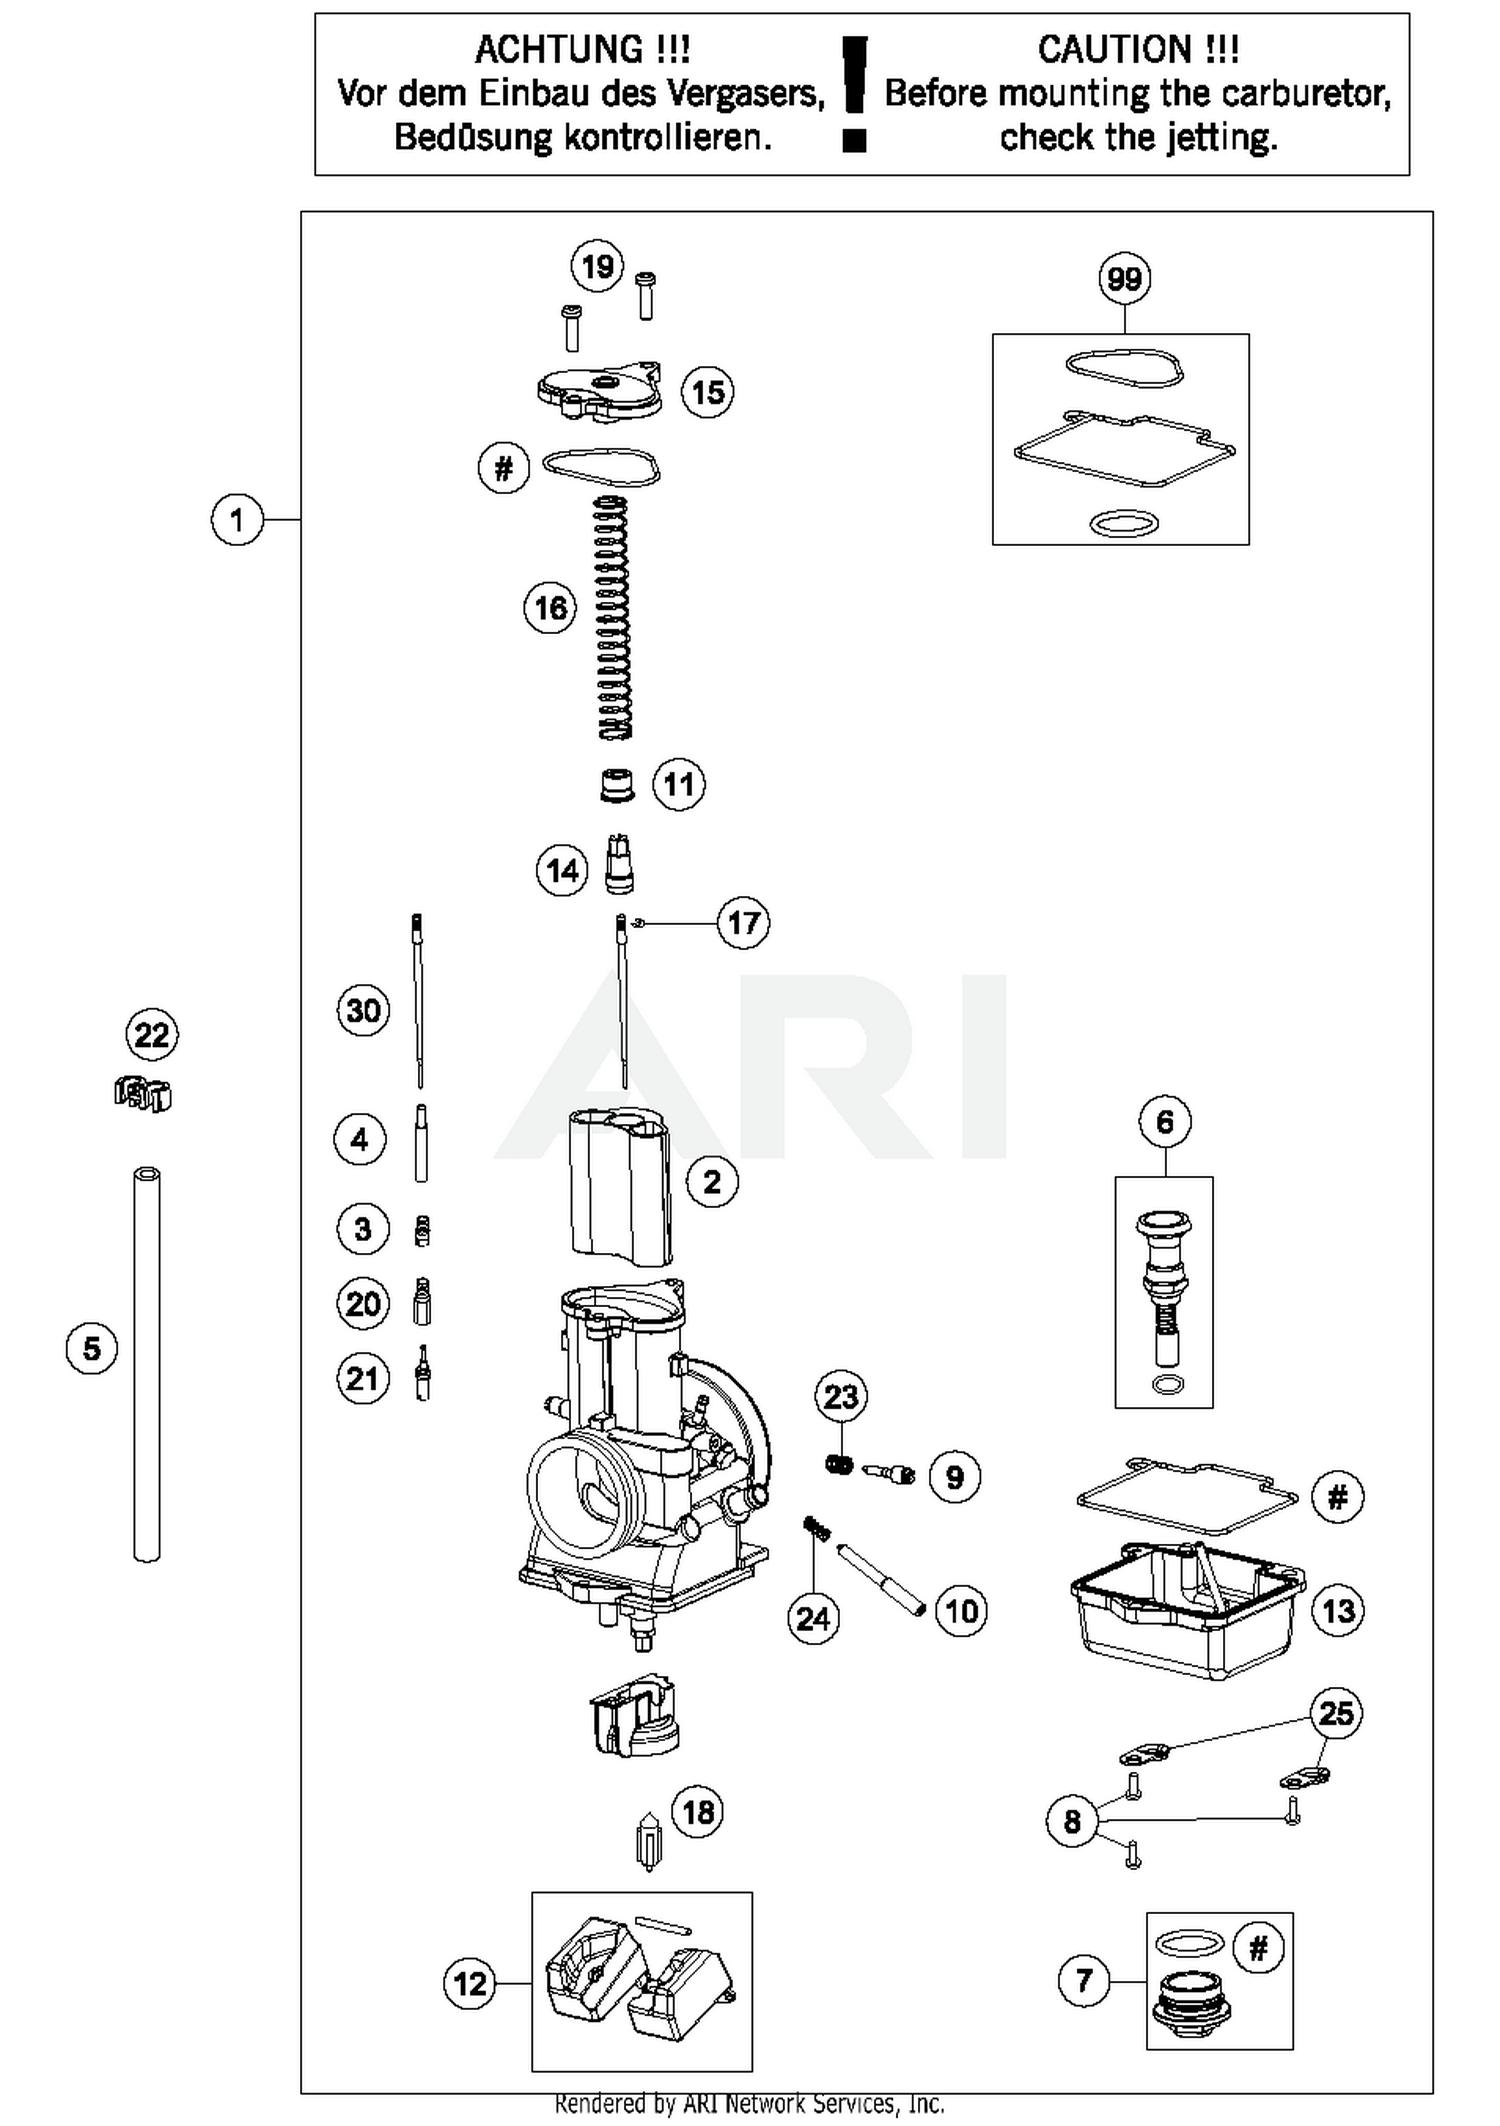 Ktm Carb Diagram - Schematic Wiring Diagram